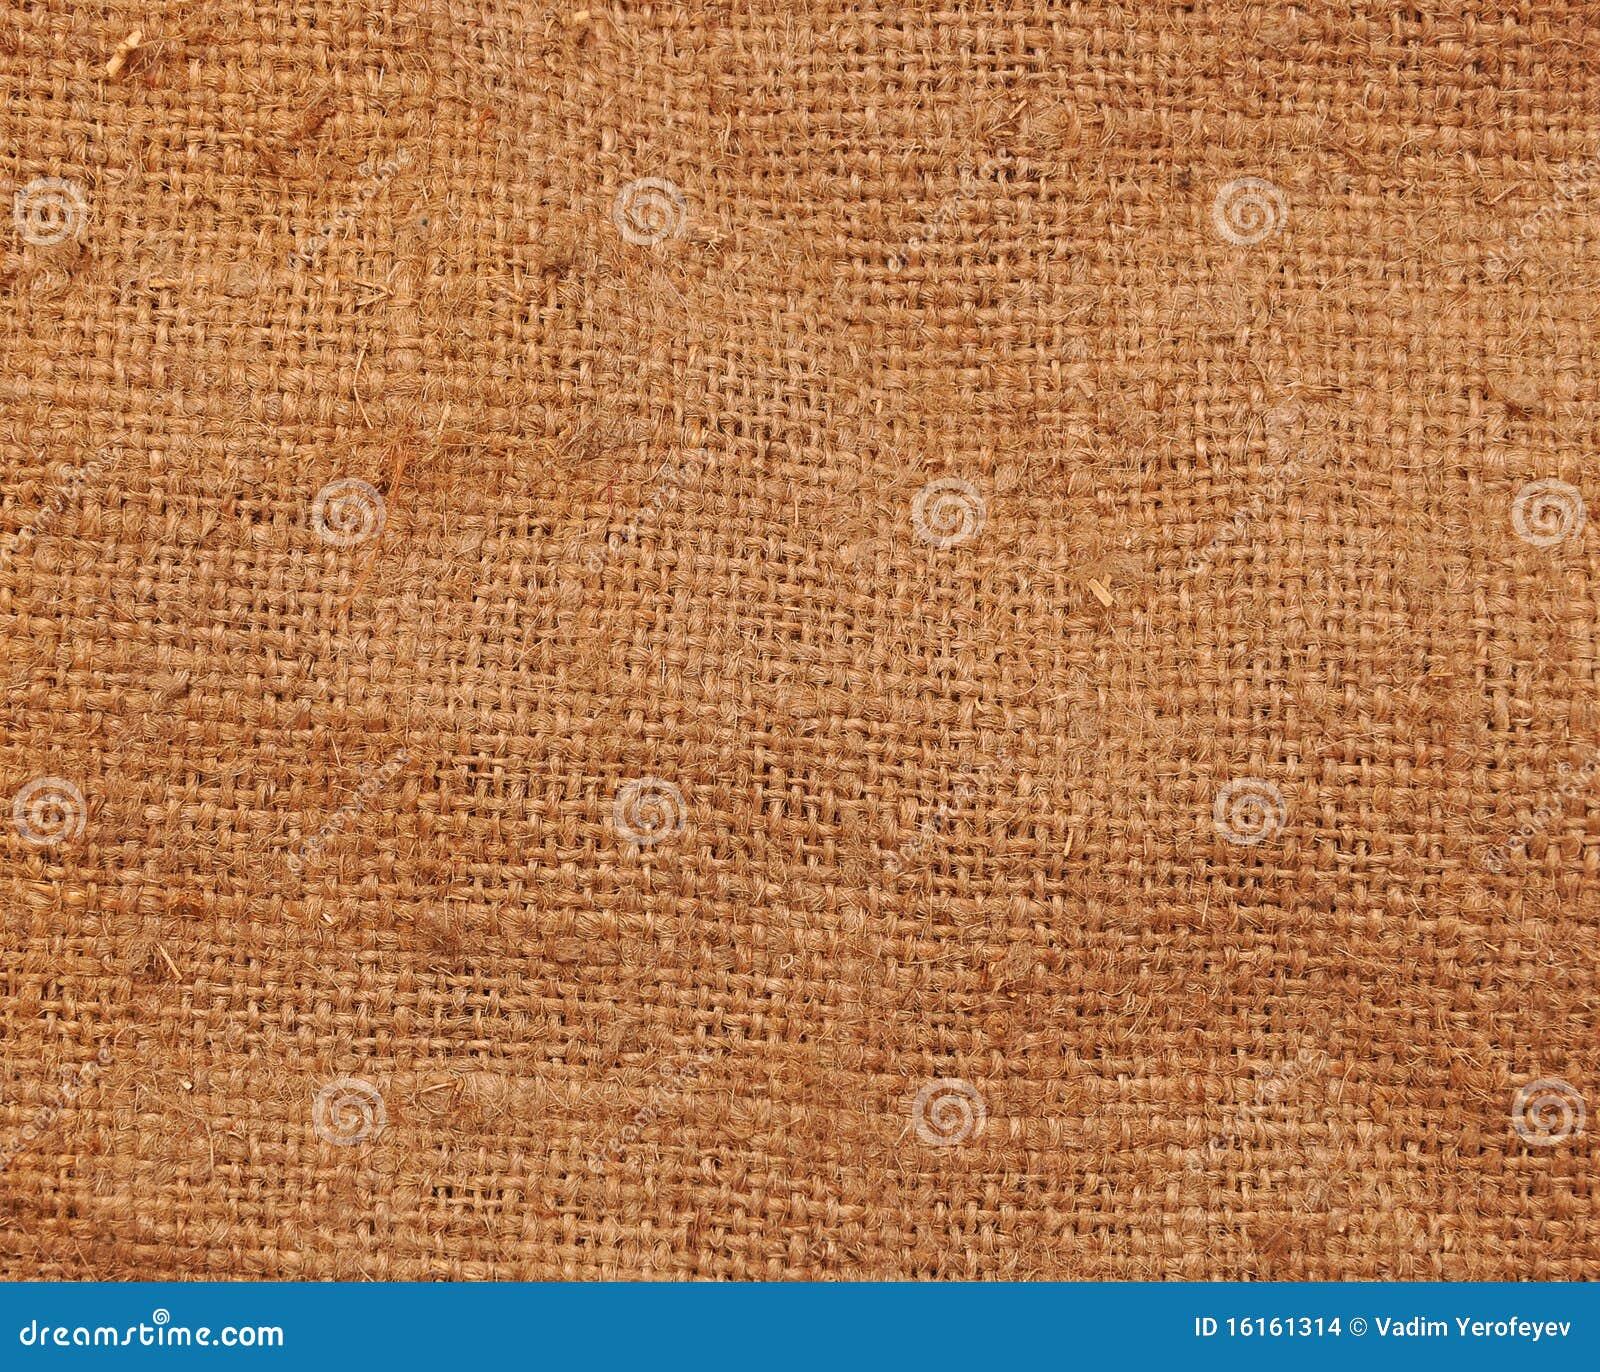 Old sack cloth canvas texture